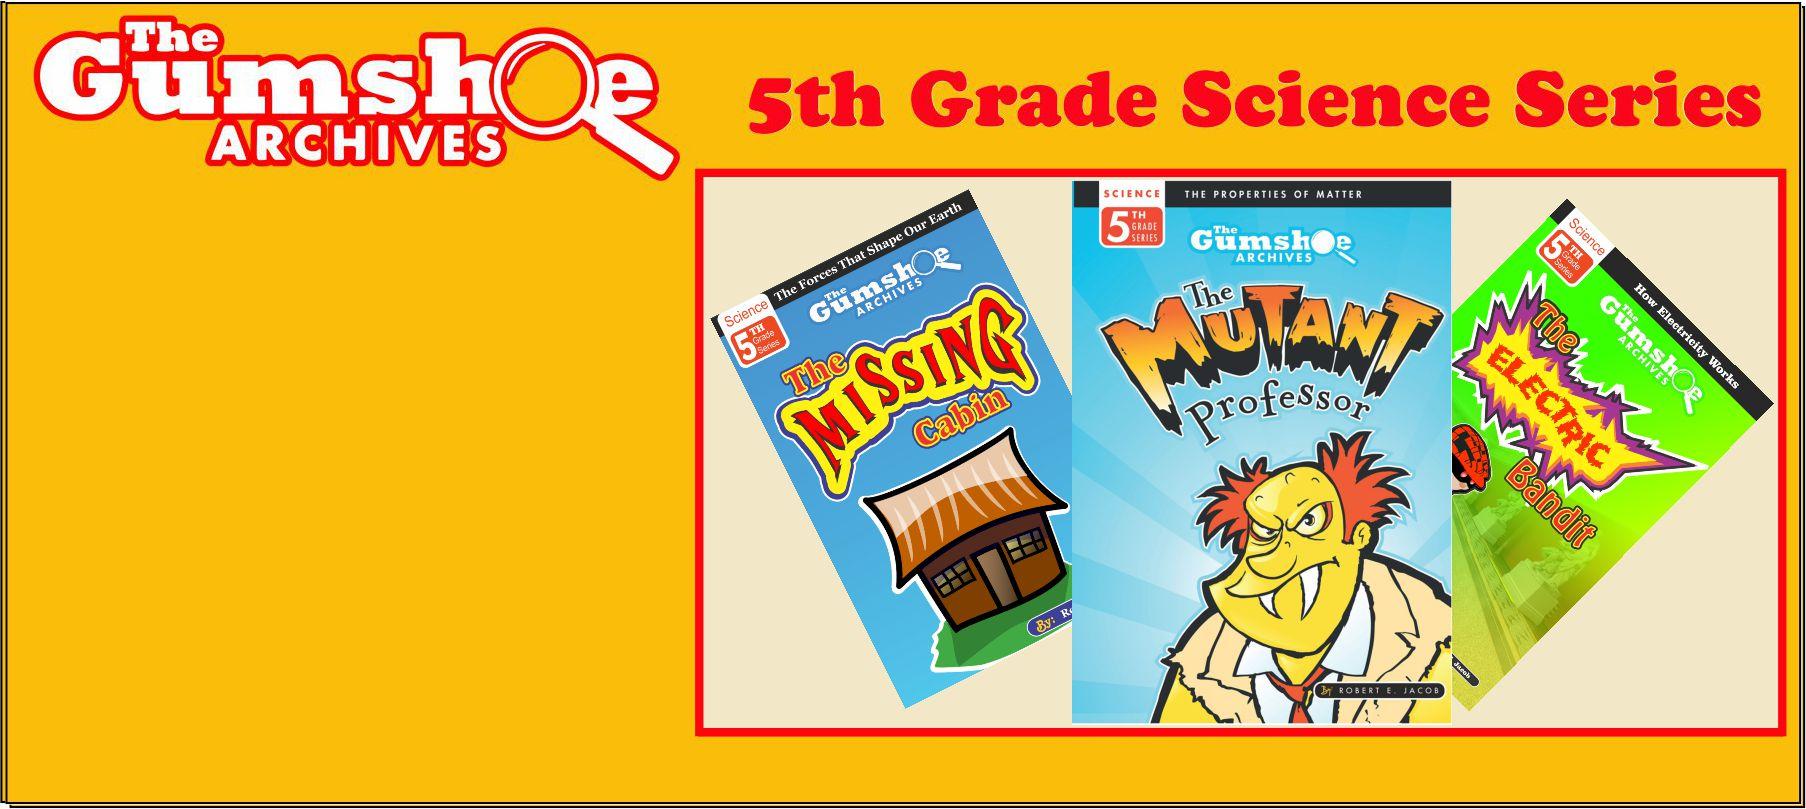 childrens science books 5th grade level